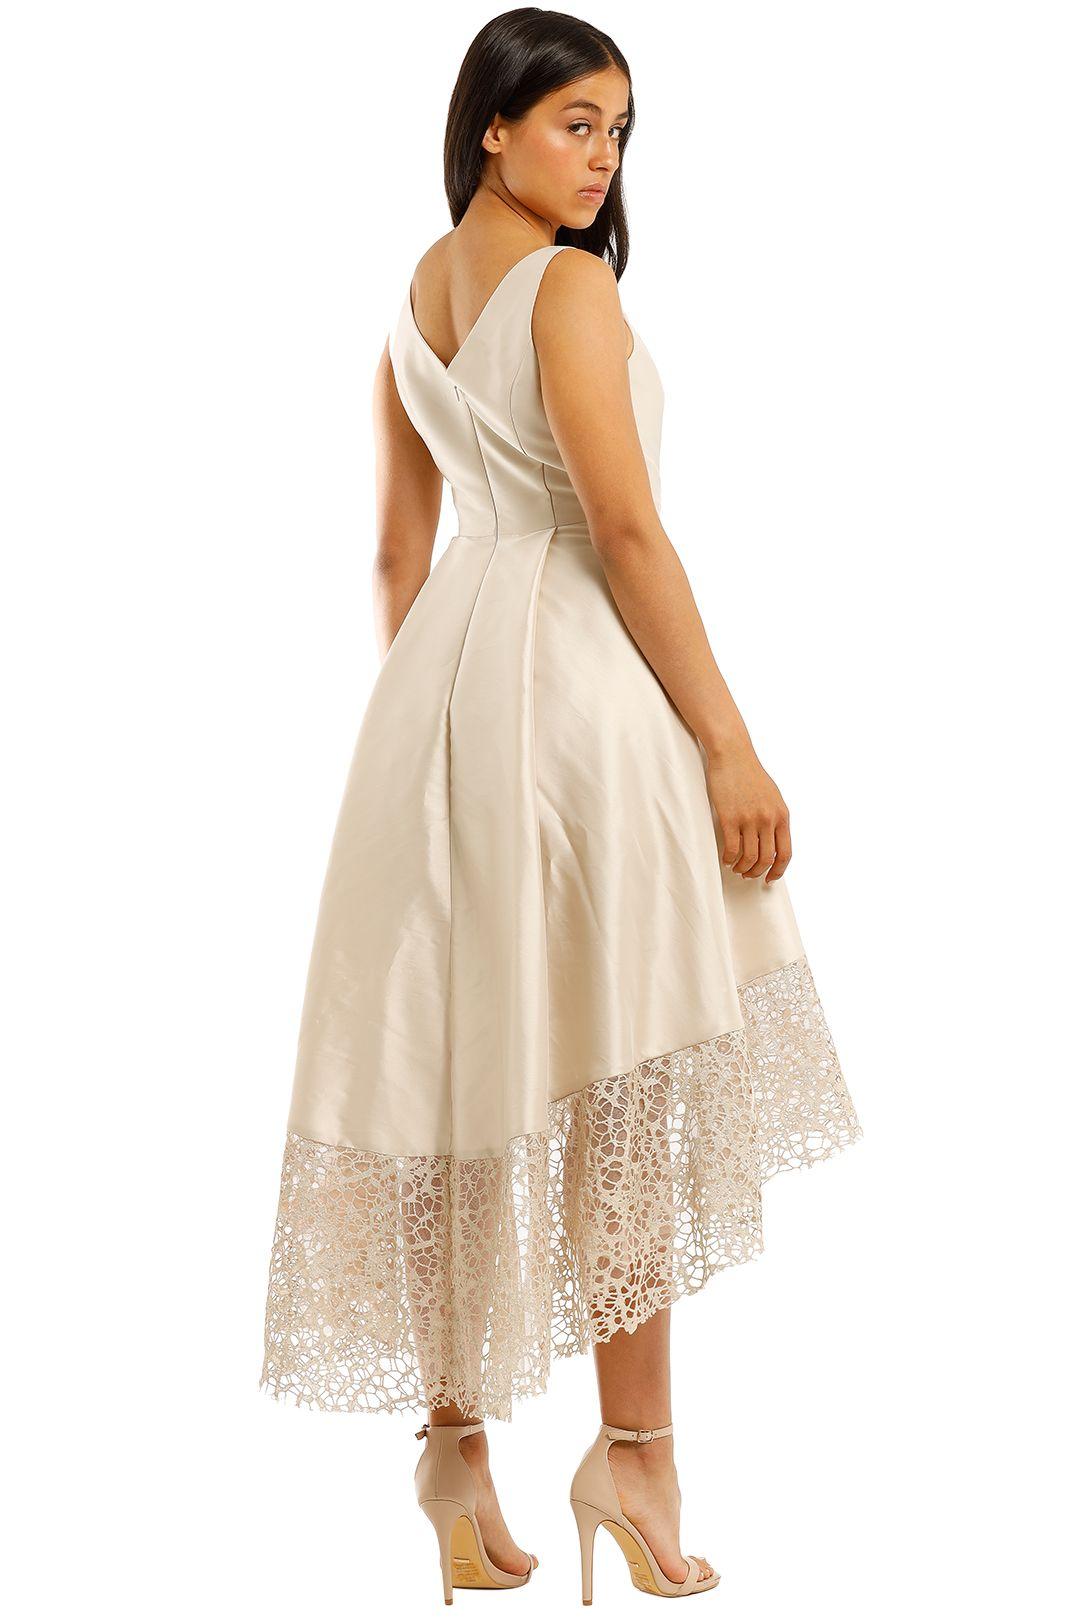 Anthea-Crawford-Satin-Hi-Lo-Dress-Lustre-Back